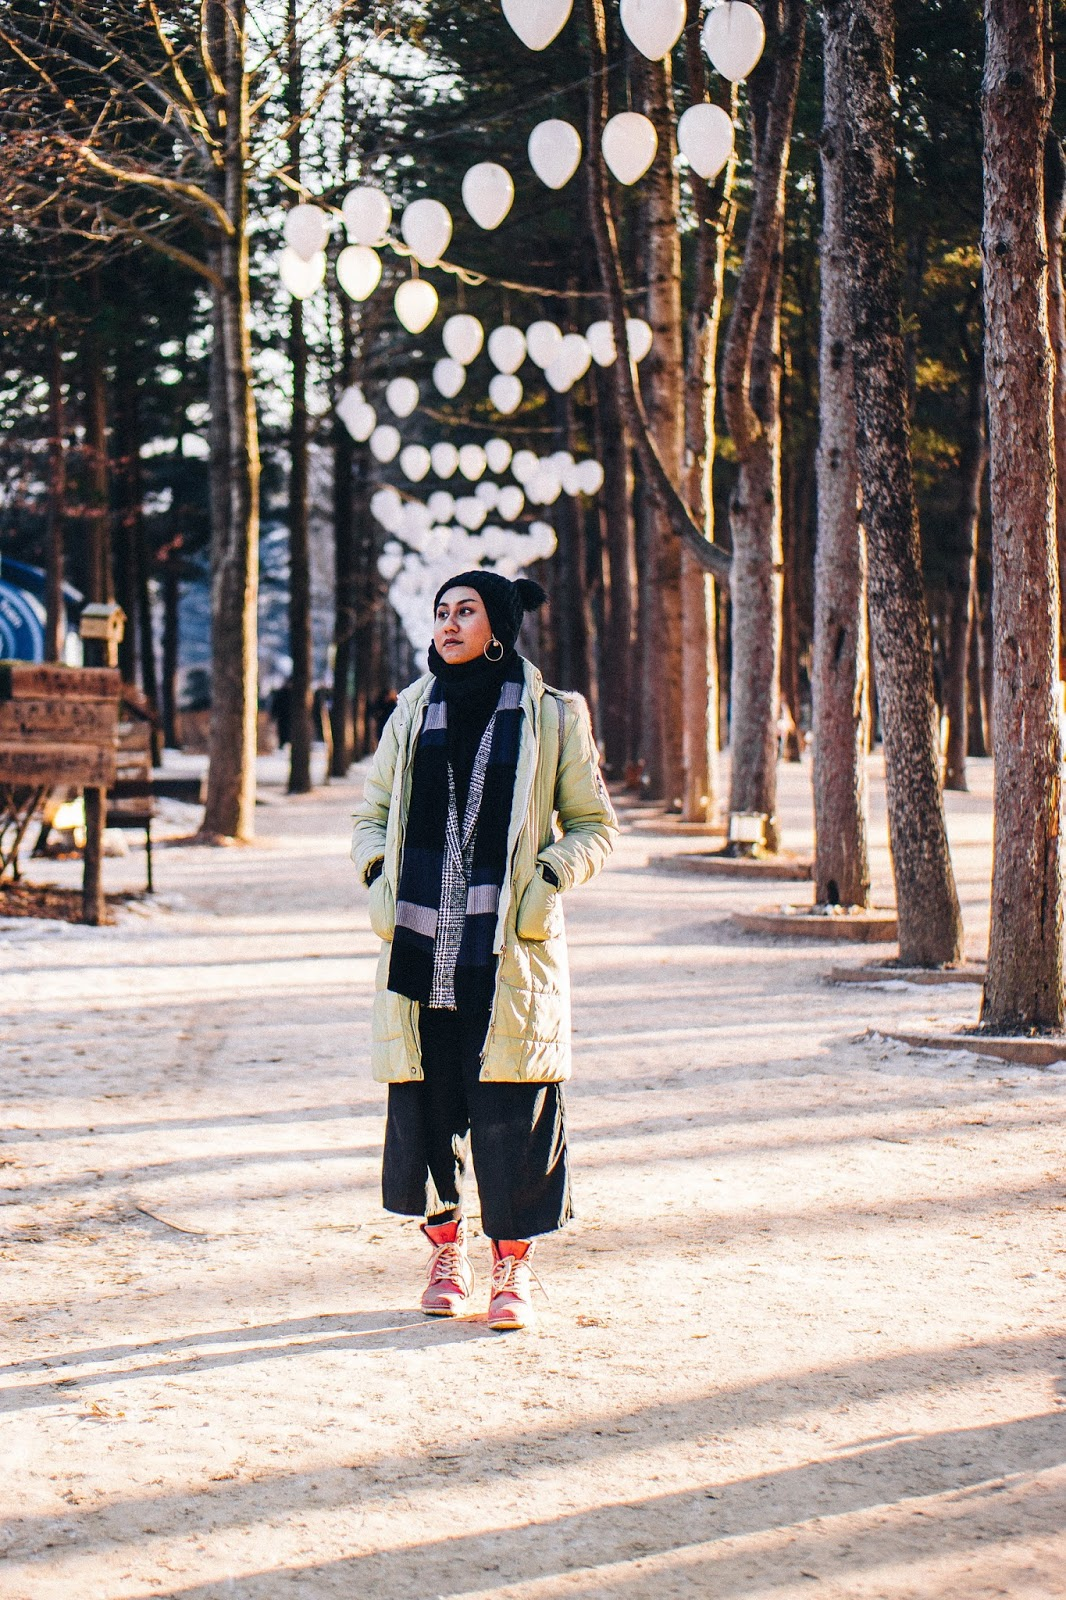 Nami Island Winter : island, winter, Photo, Diary:, Winter, Island,, South, Korea, Weekender